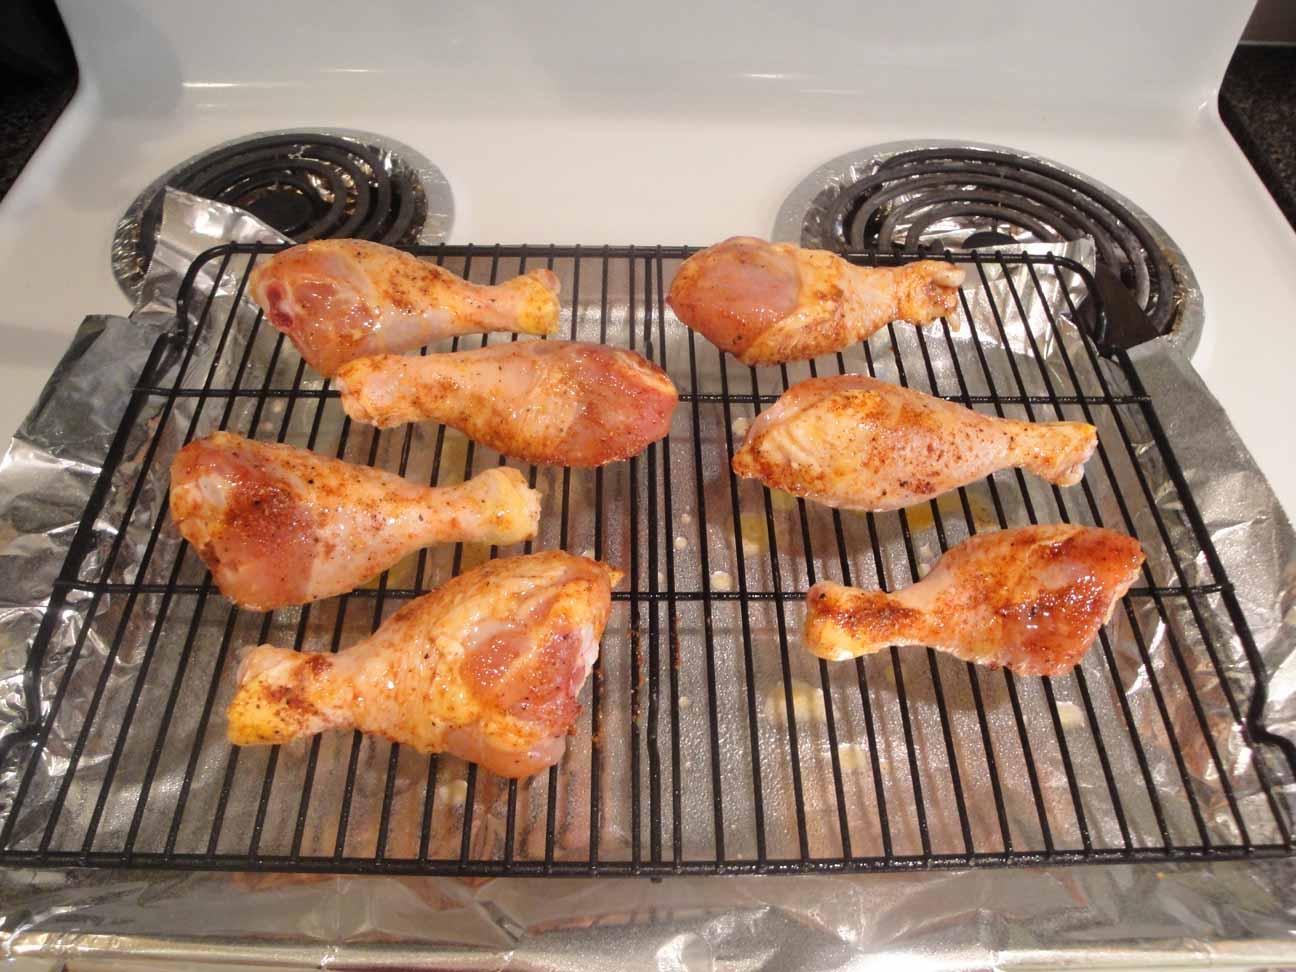 kiwigirl cooking oven bbq 39 d chicken. Black Bedroom Furniture Sets. Home Design Ideas